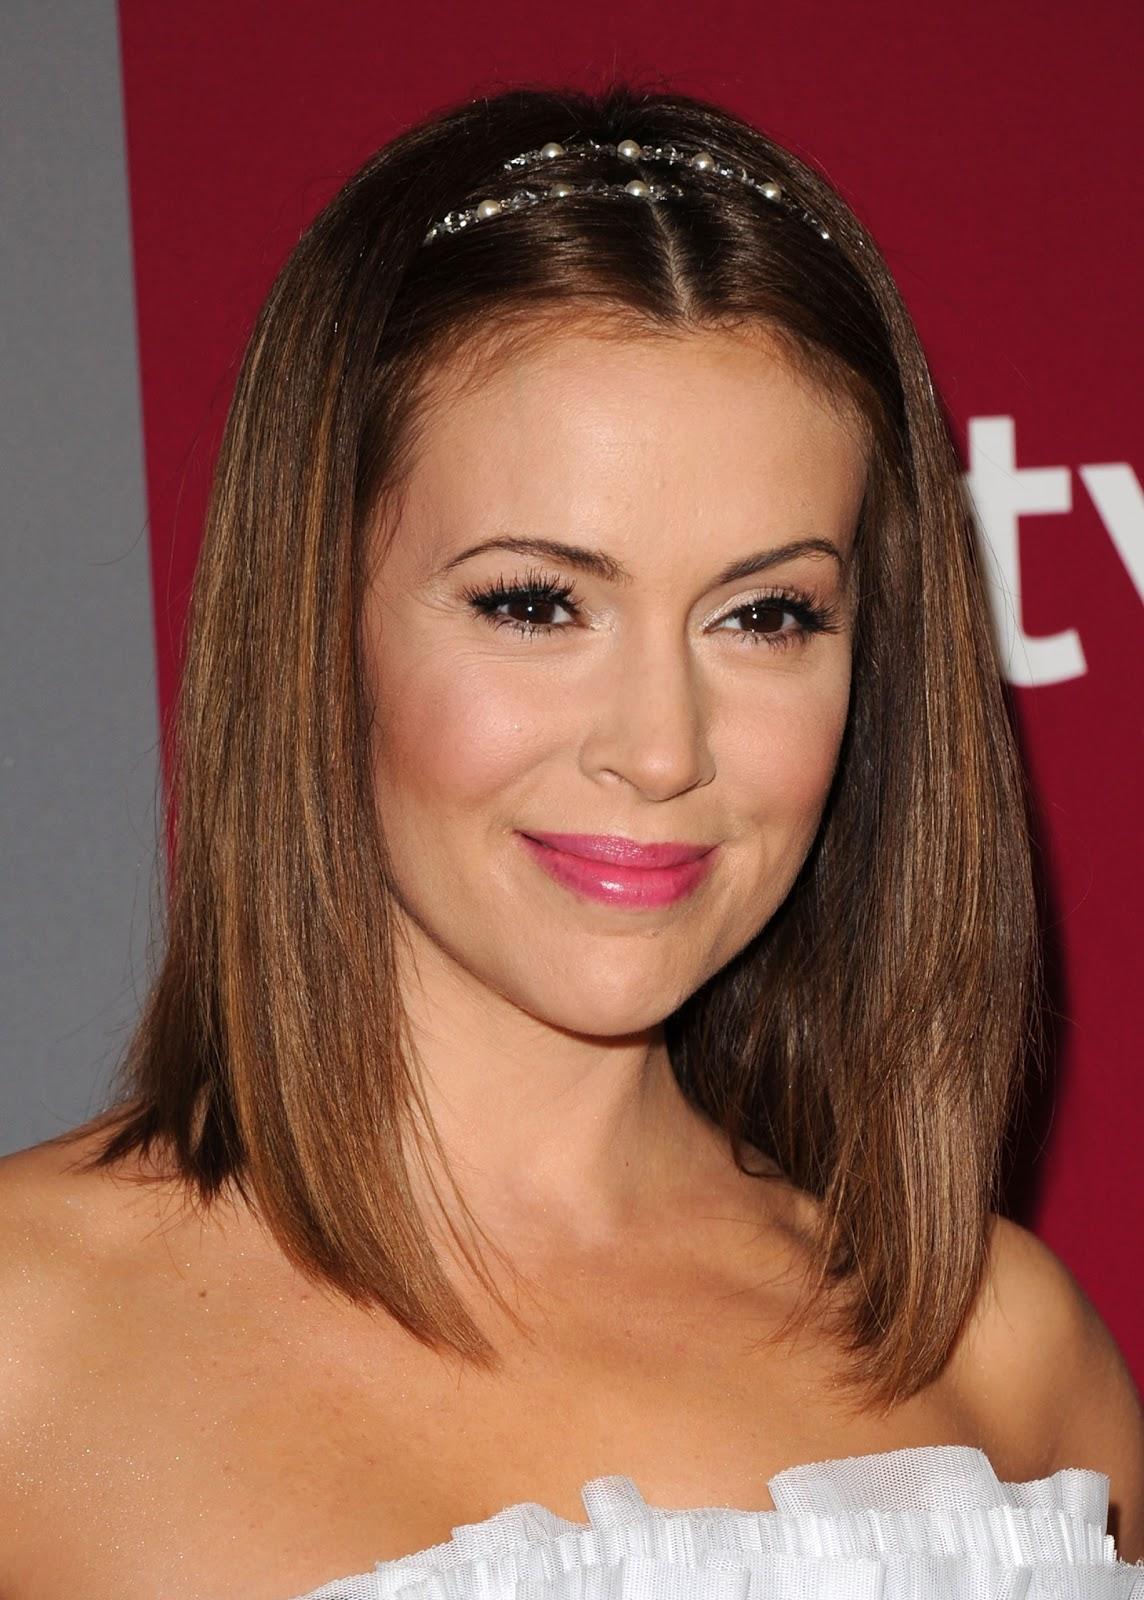 Sensational Celebrity Alyssa Milano Latest Hairstyle Pictures Prom Hairstyles Short Hairstyles Gunalazisus